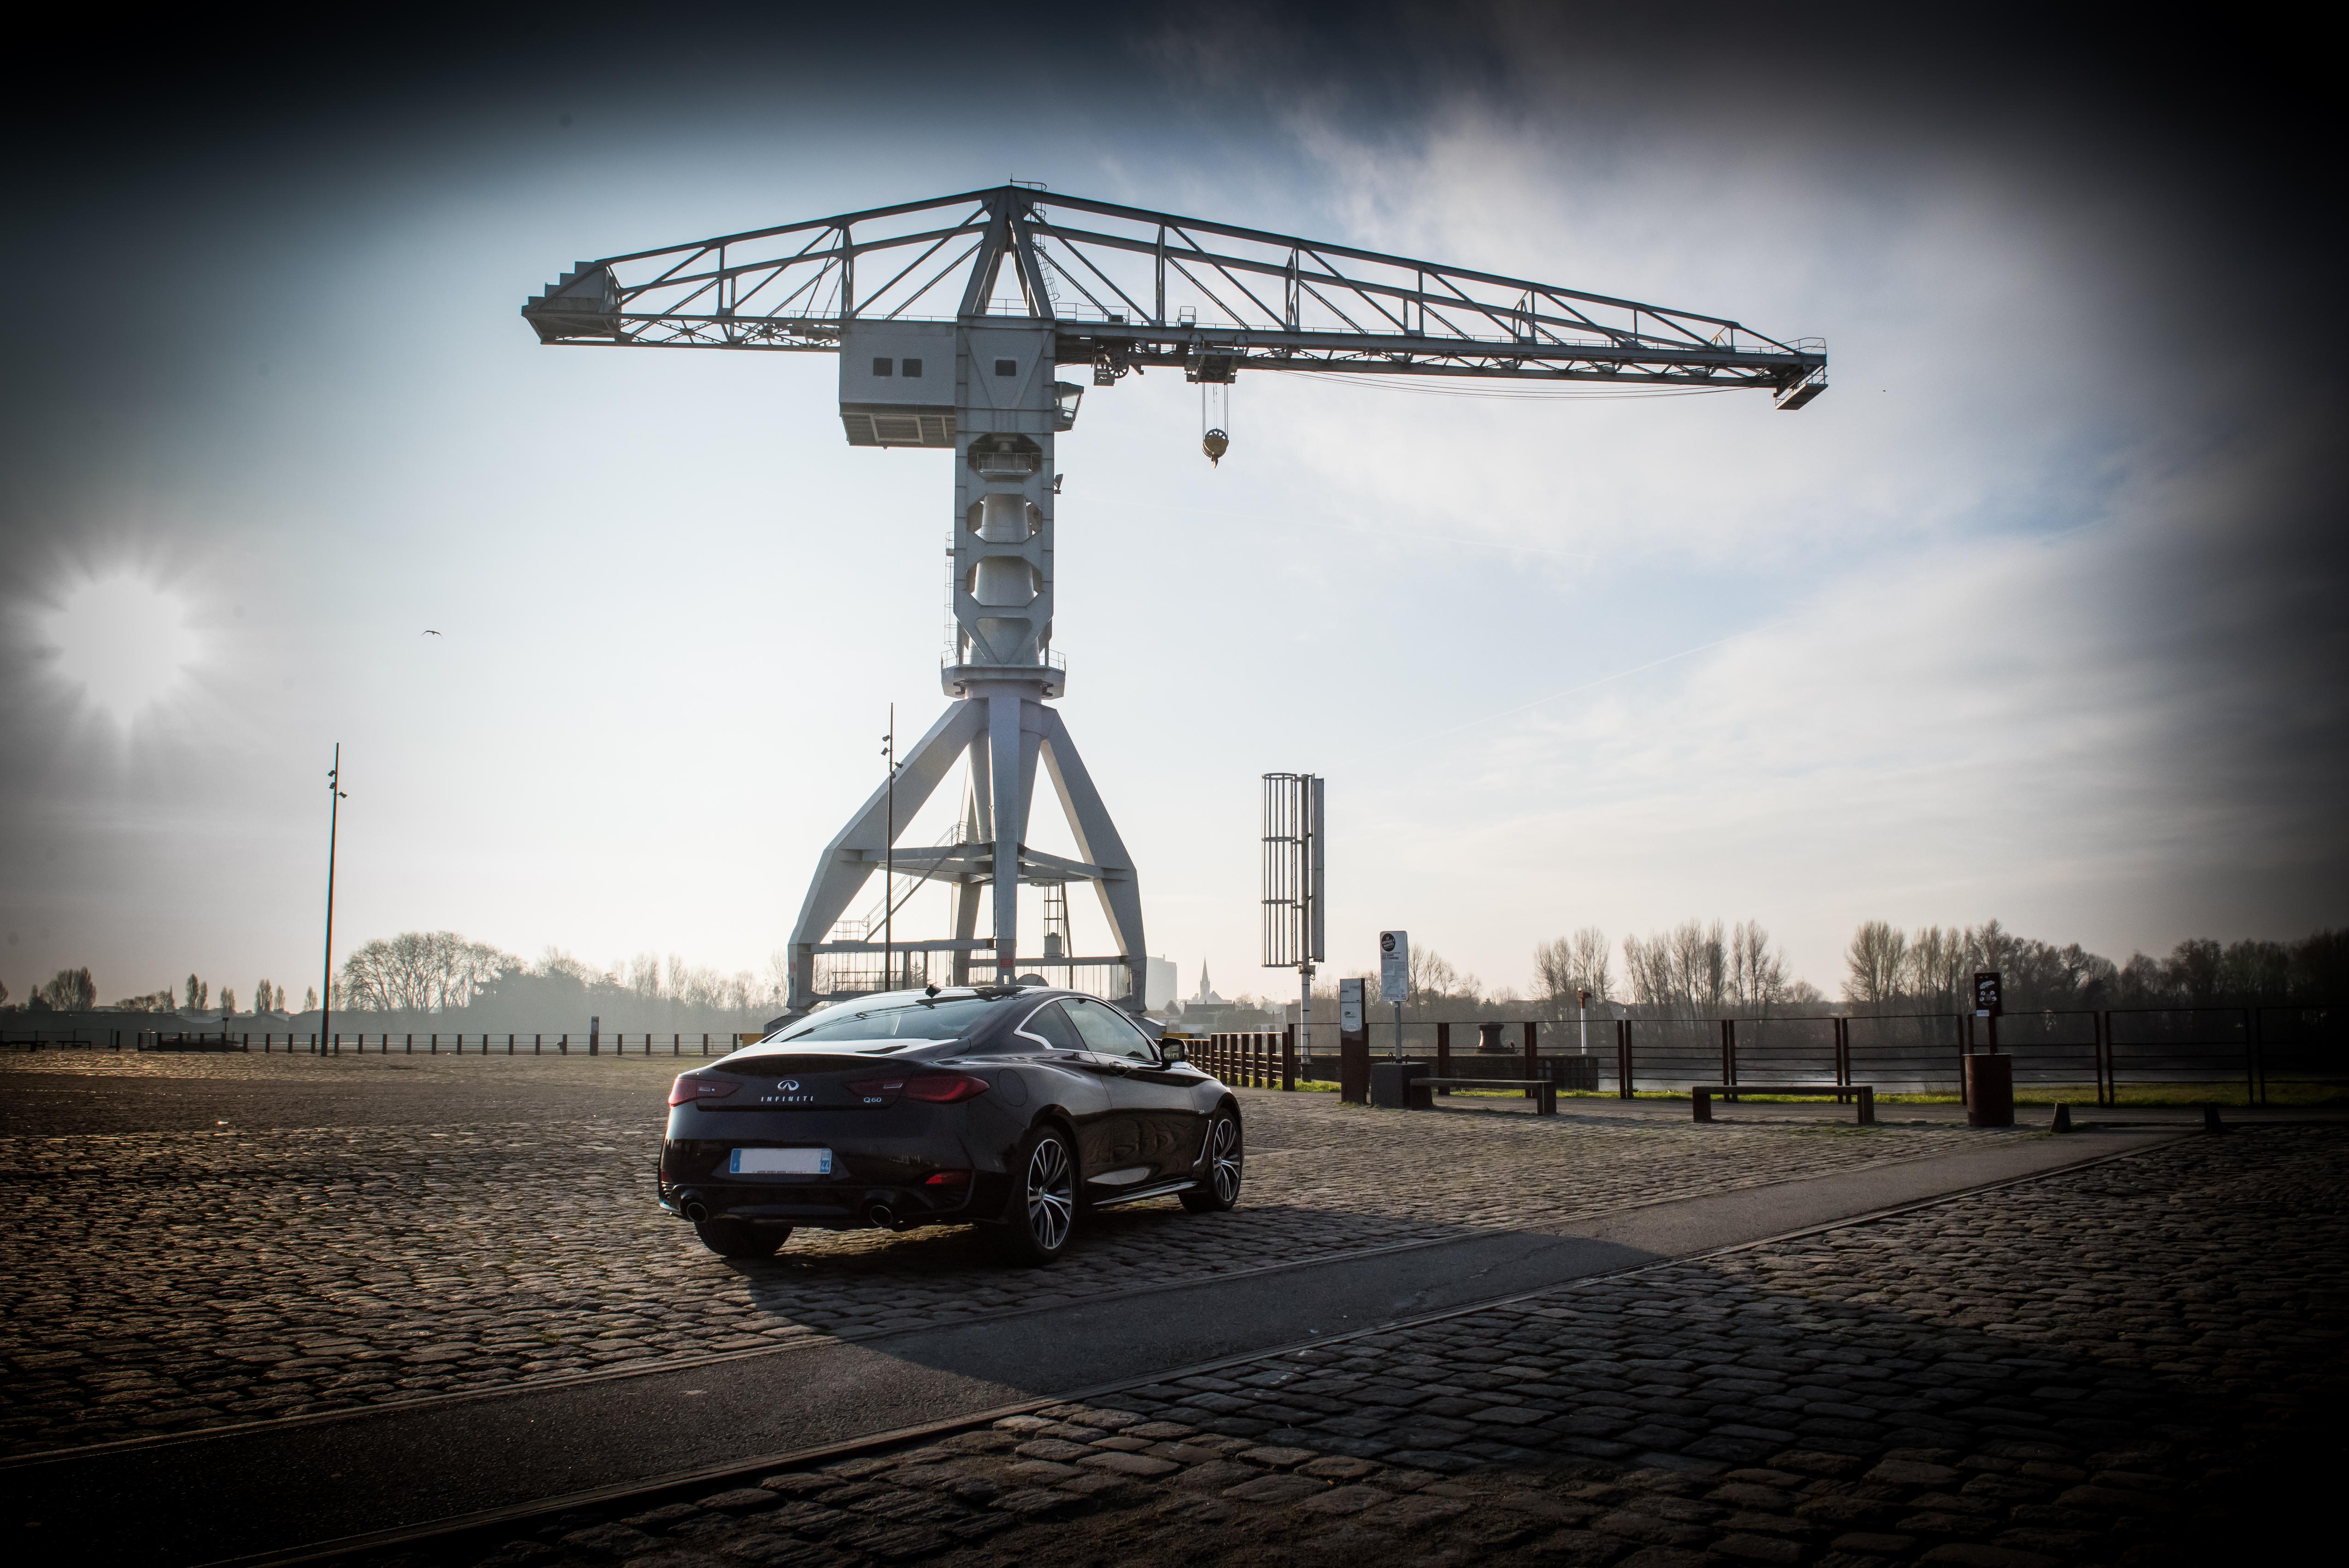 photographe automobile ambiance